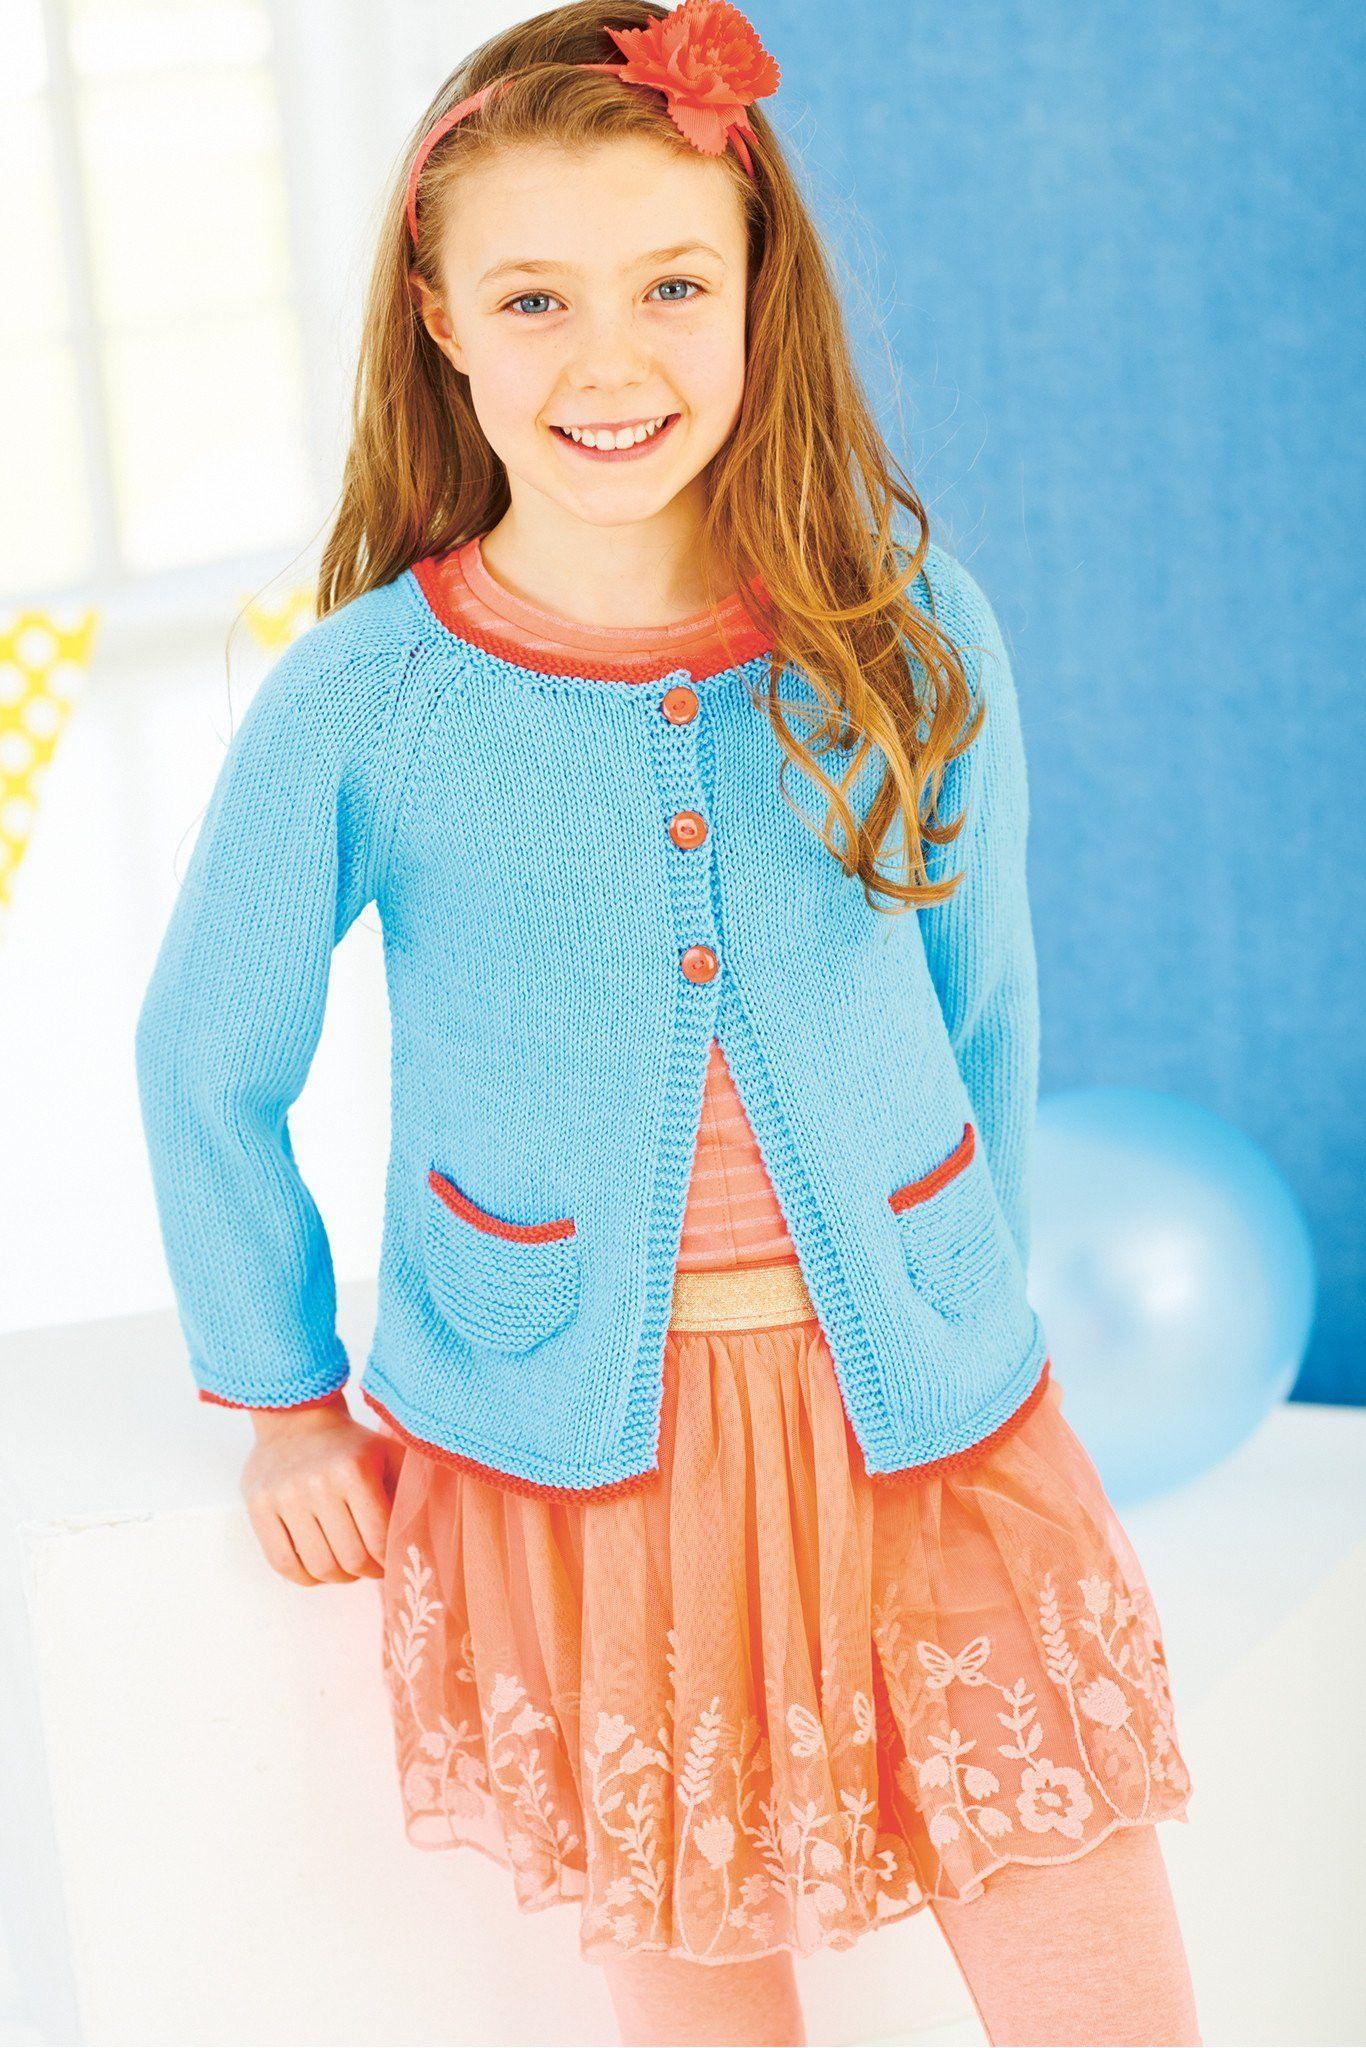 Summer Girls Cardigan Knitting Pattern   The Knitting Network